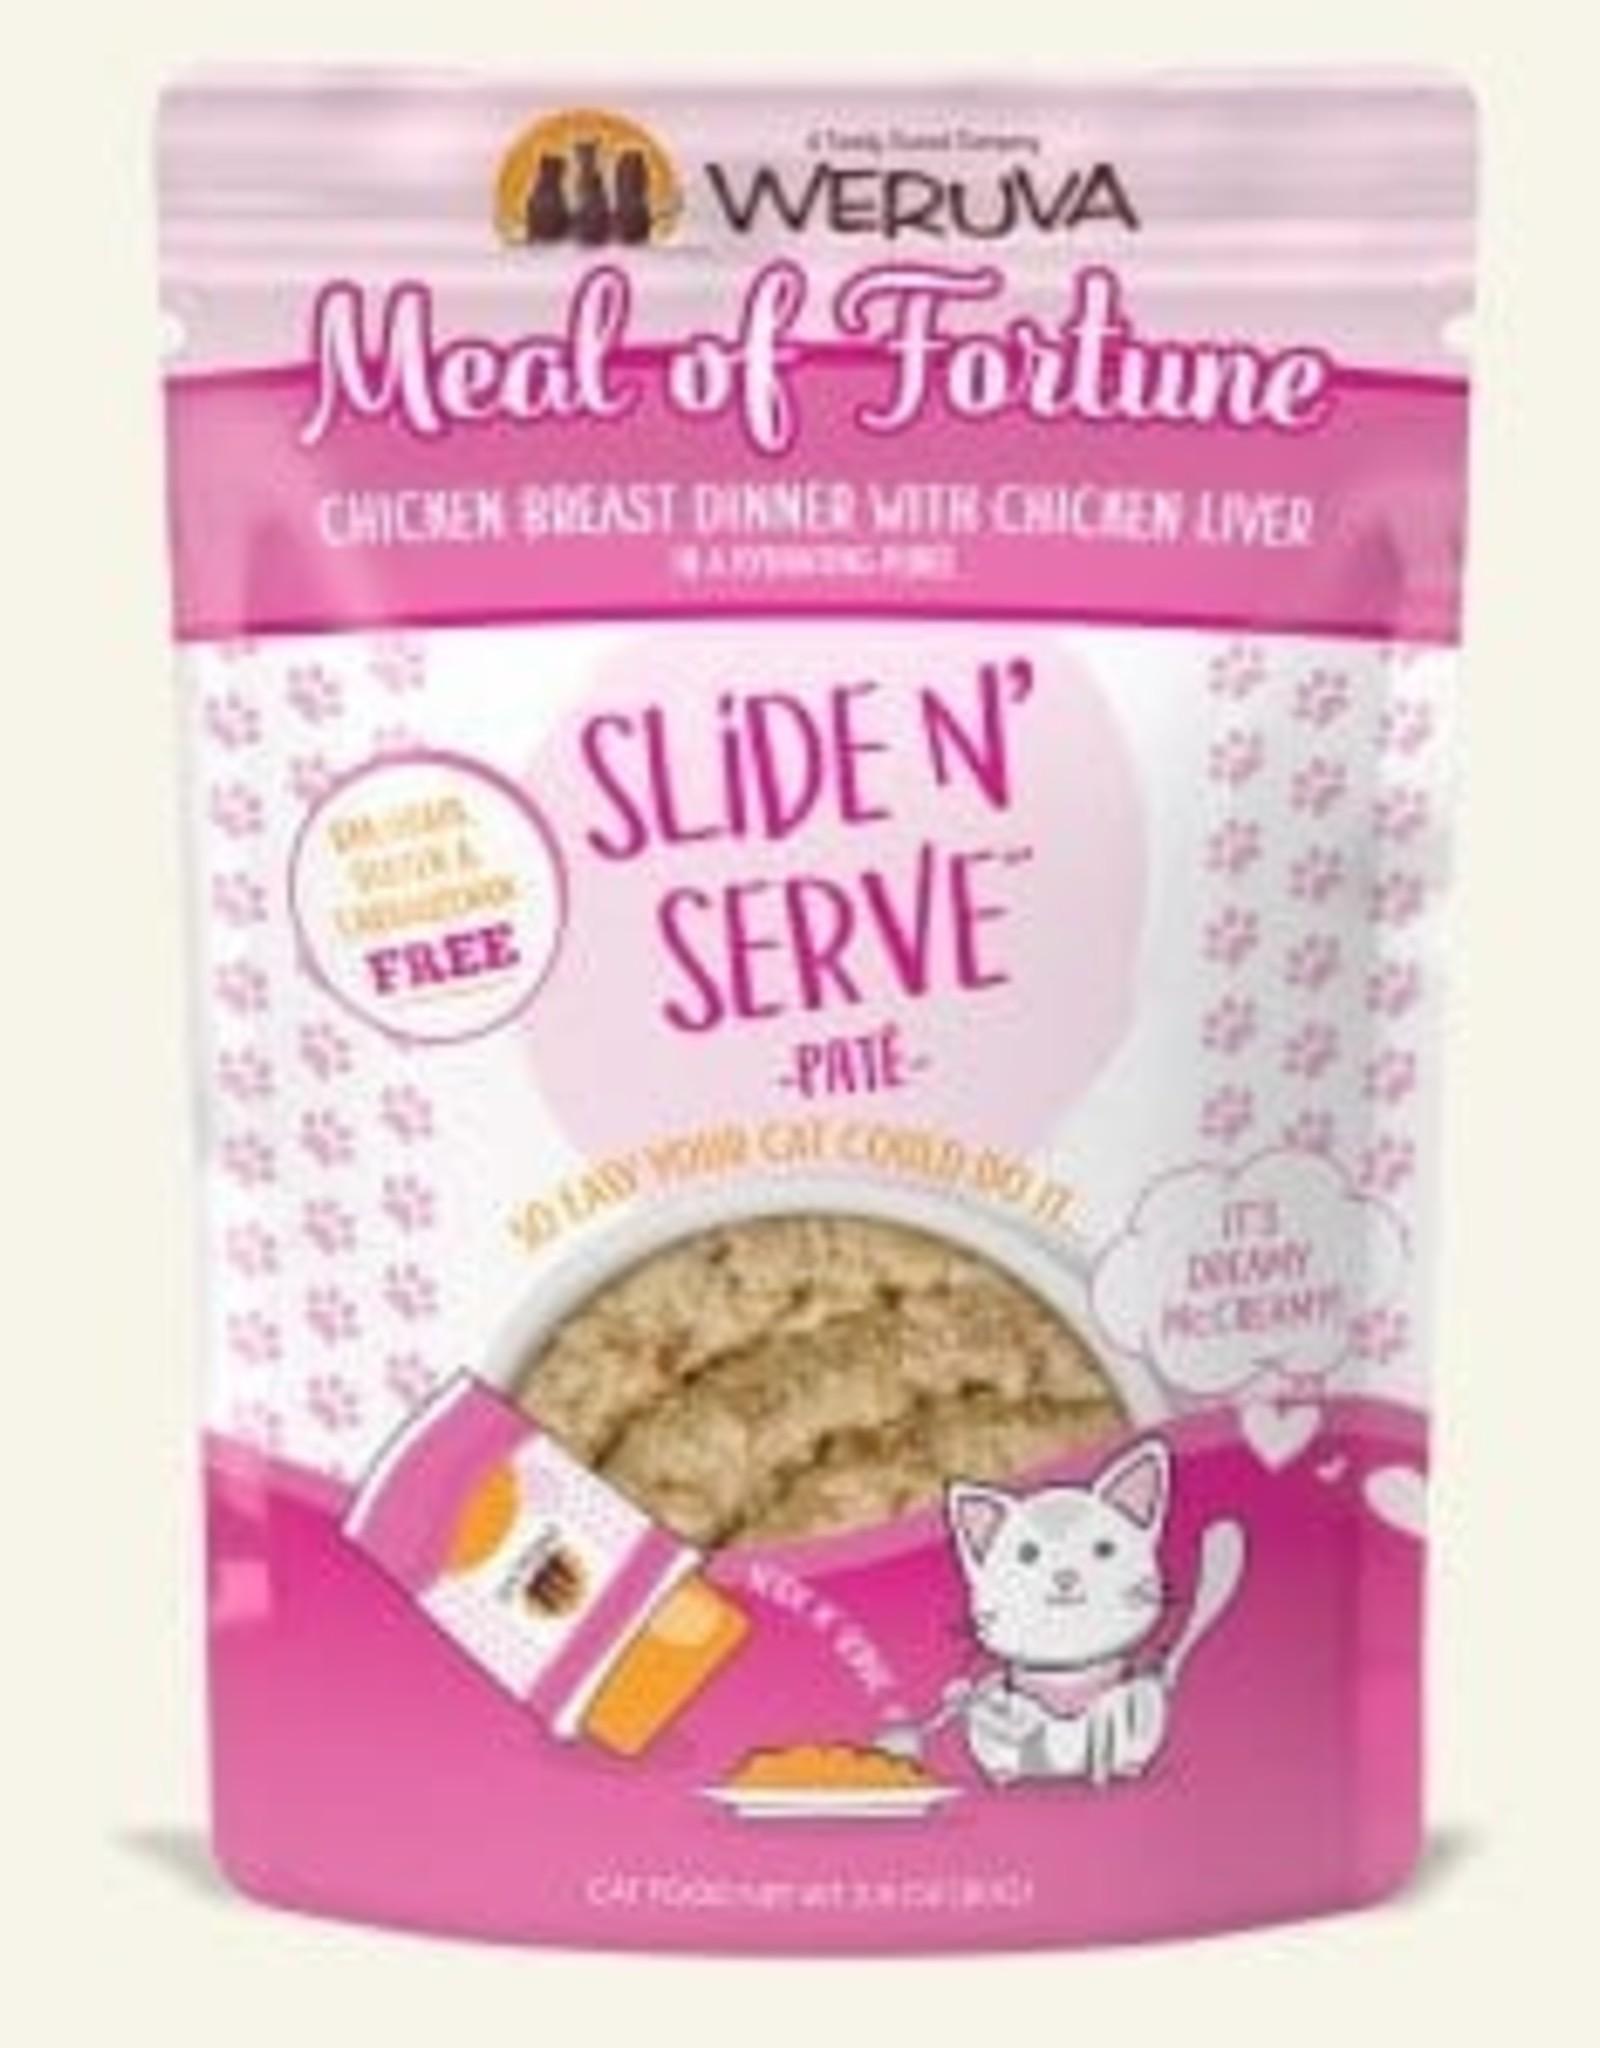 WERUVA Cat SNS Meal of Fortune Pate - Grain-Free 5.5oz